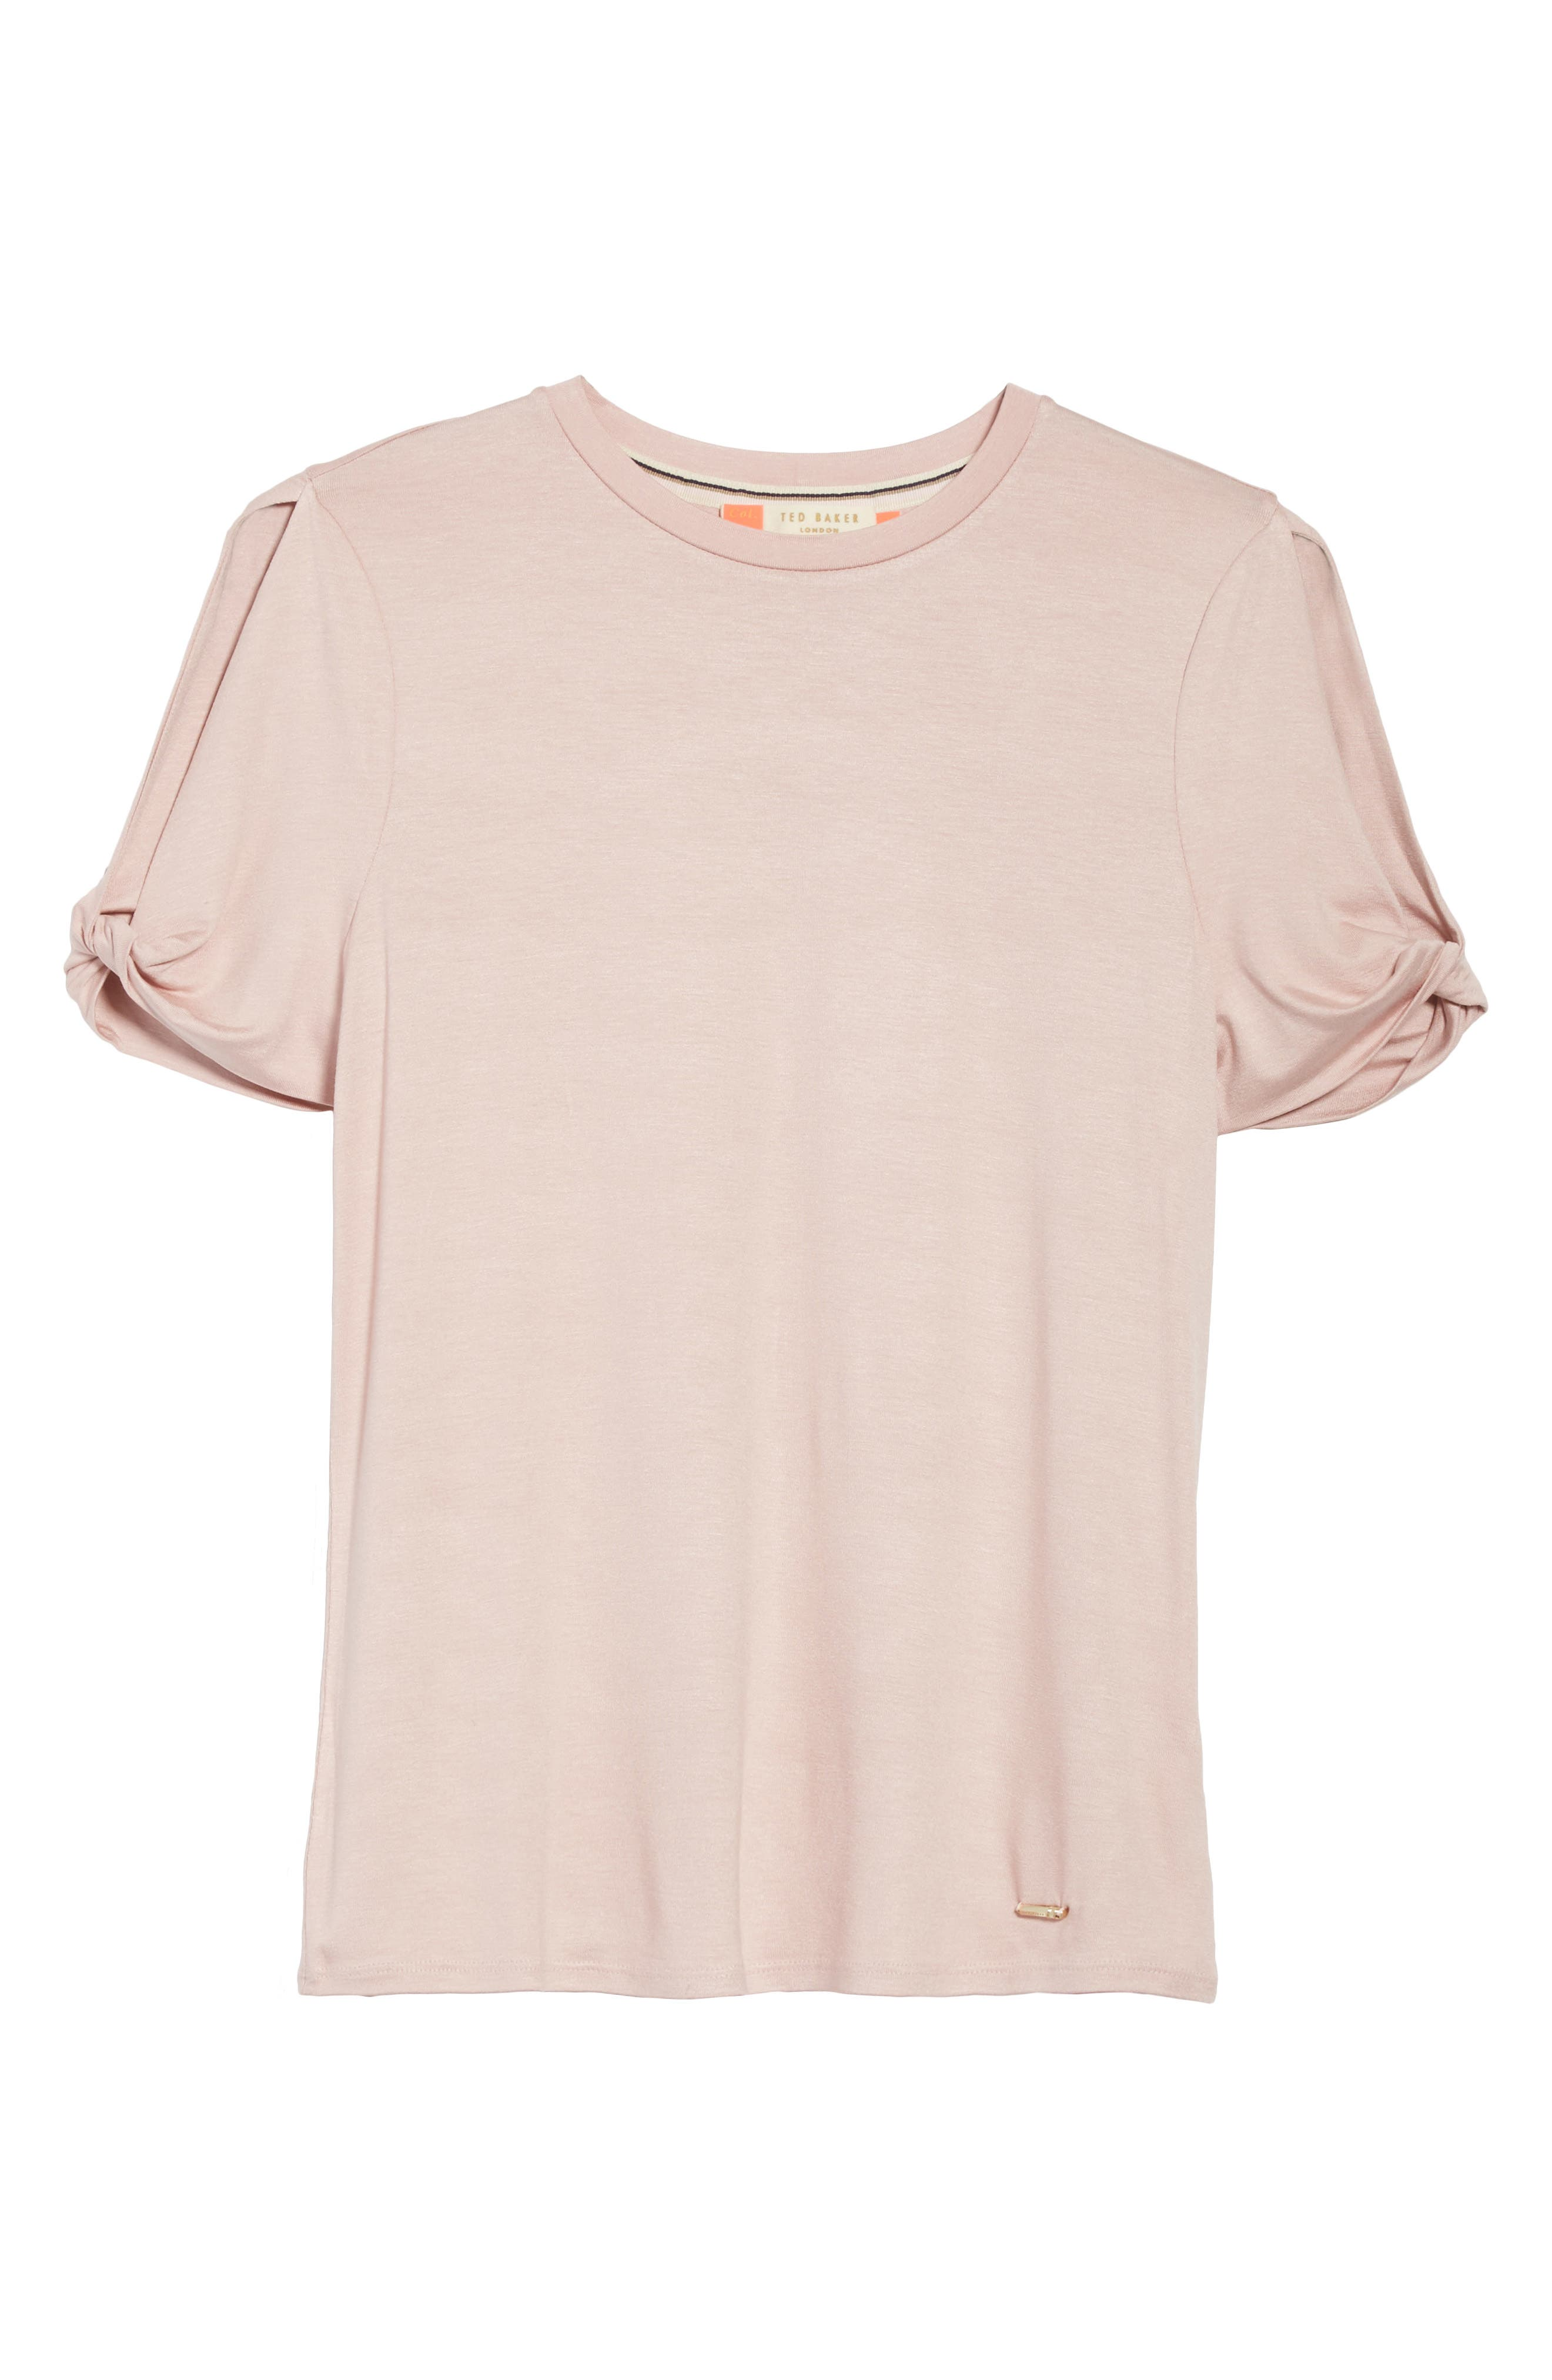 Narva Jersey Top,                             Alternate thumbnail 6, color,                             Nude Pink